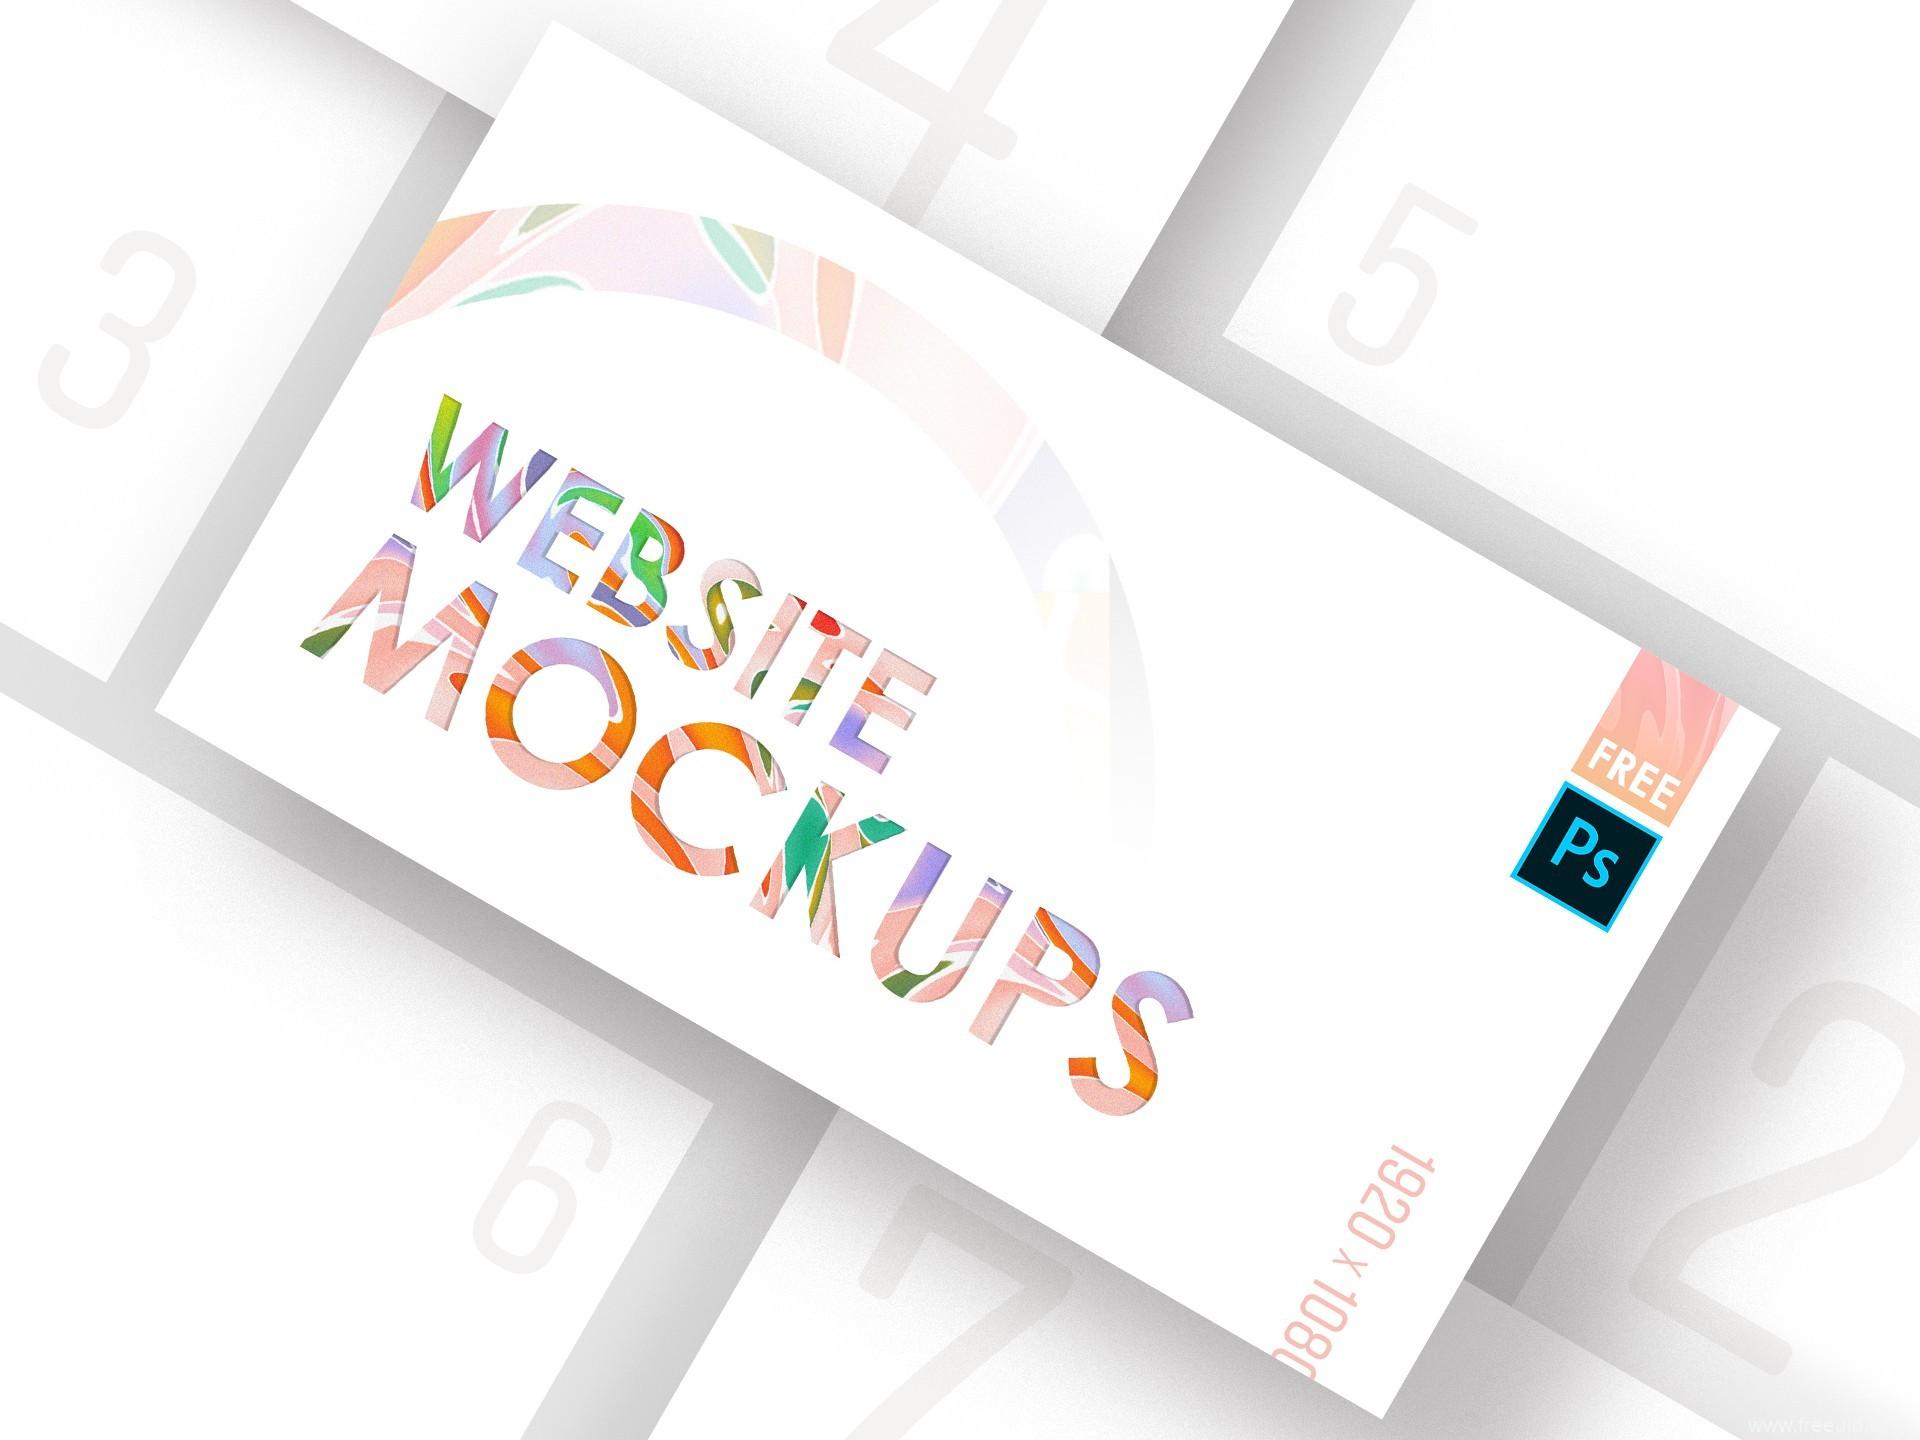 Website Mockups 样机展示模板psd源文件下载